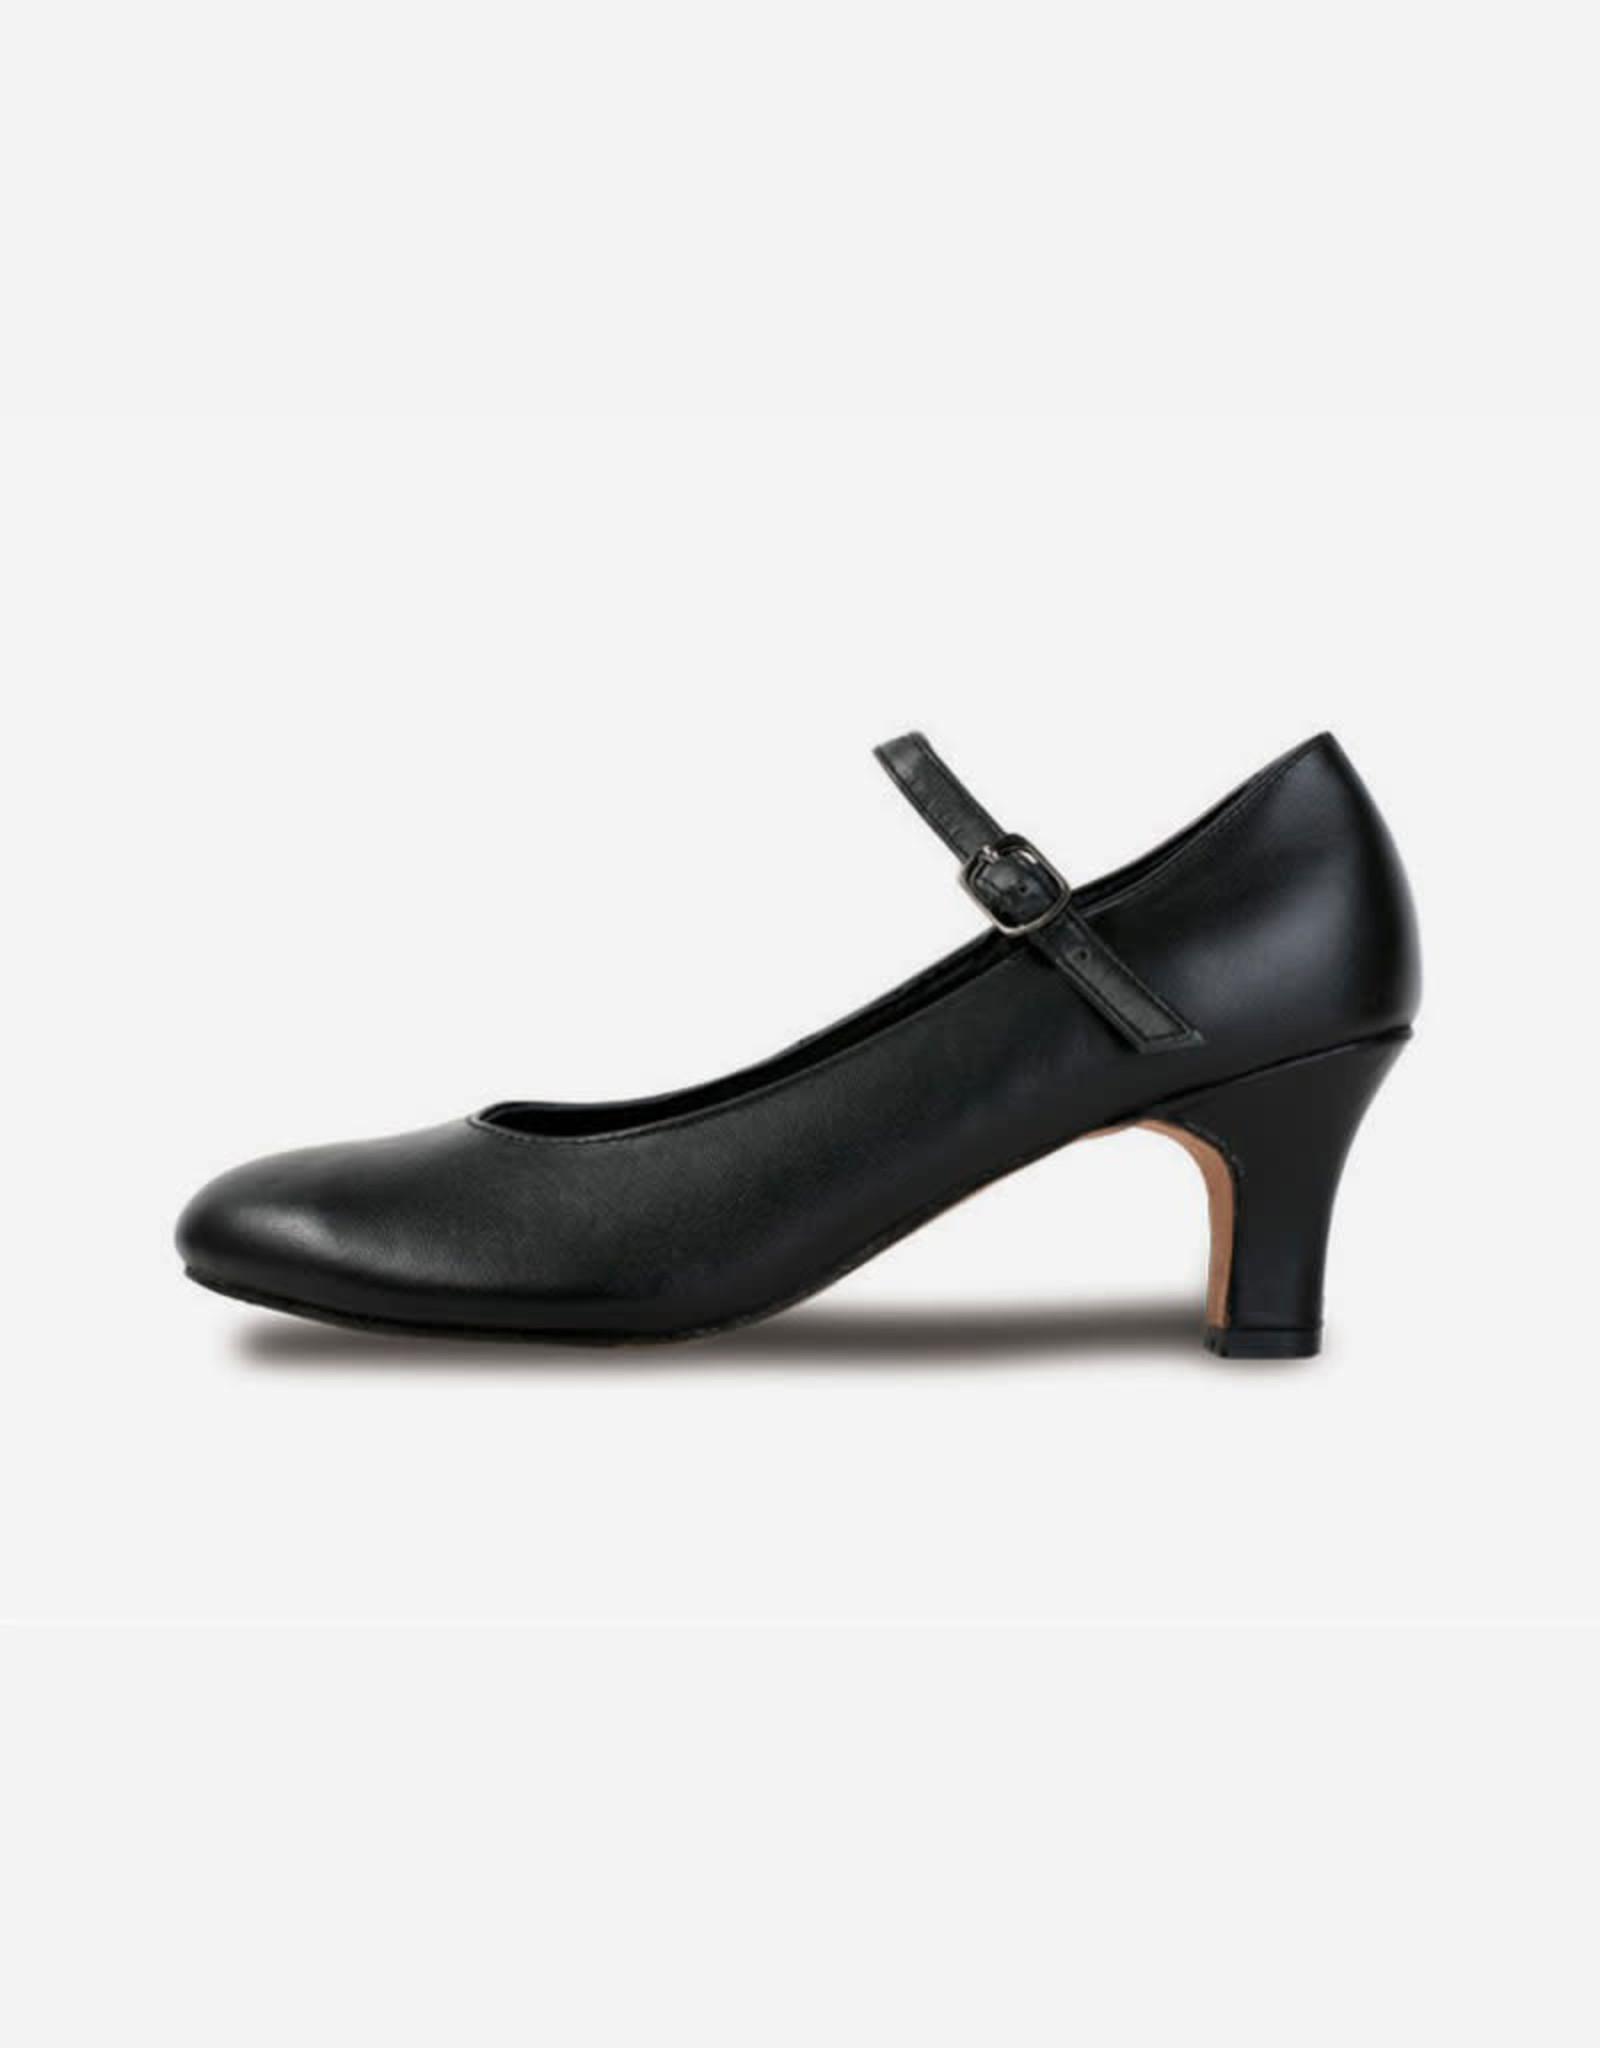 Sansha Roberta Shoes